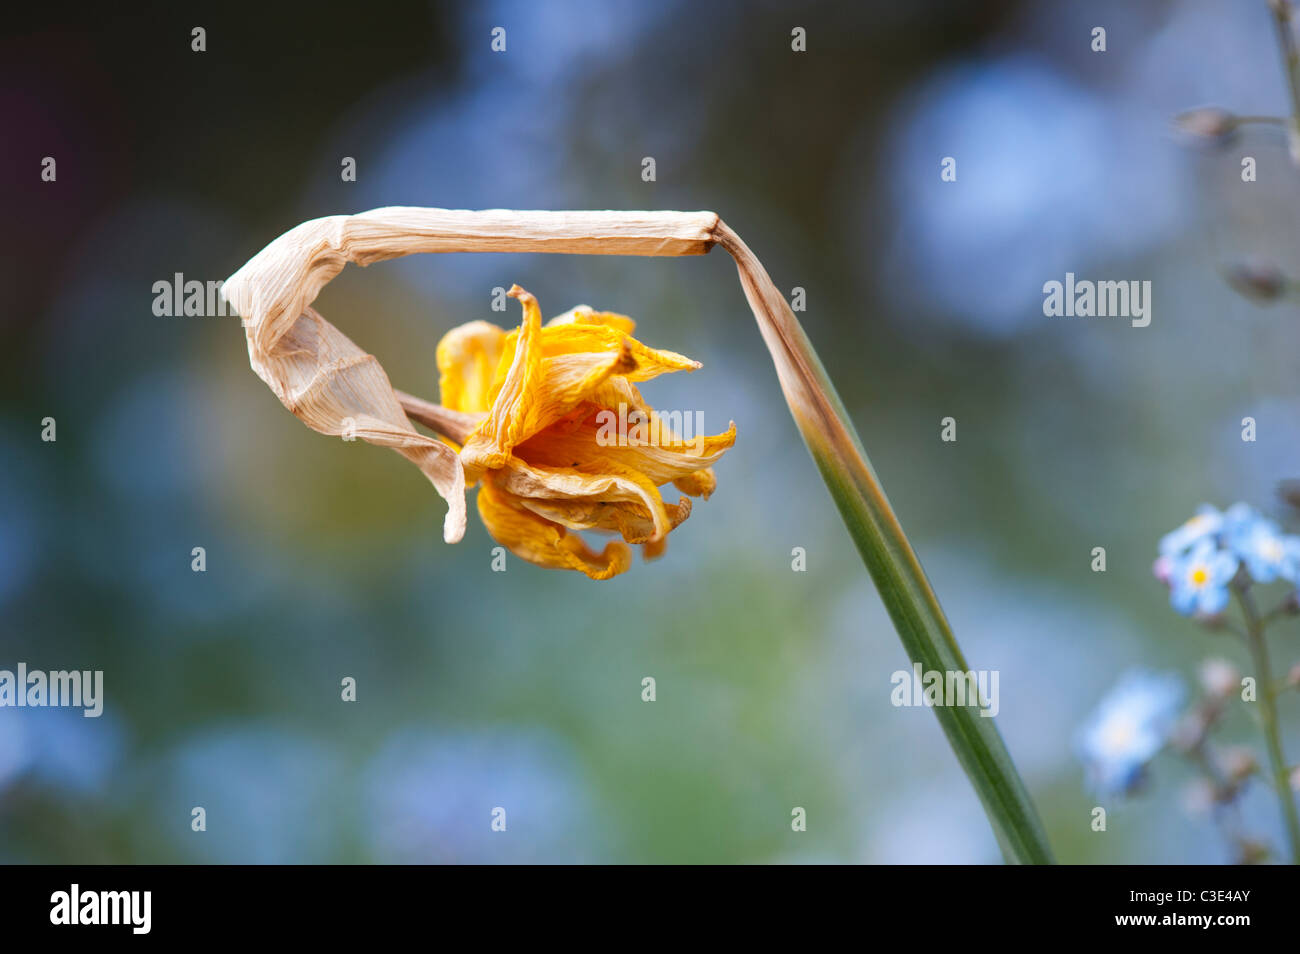 Dead tete a tete daffodil flower in the garden - Stock Image